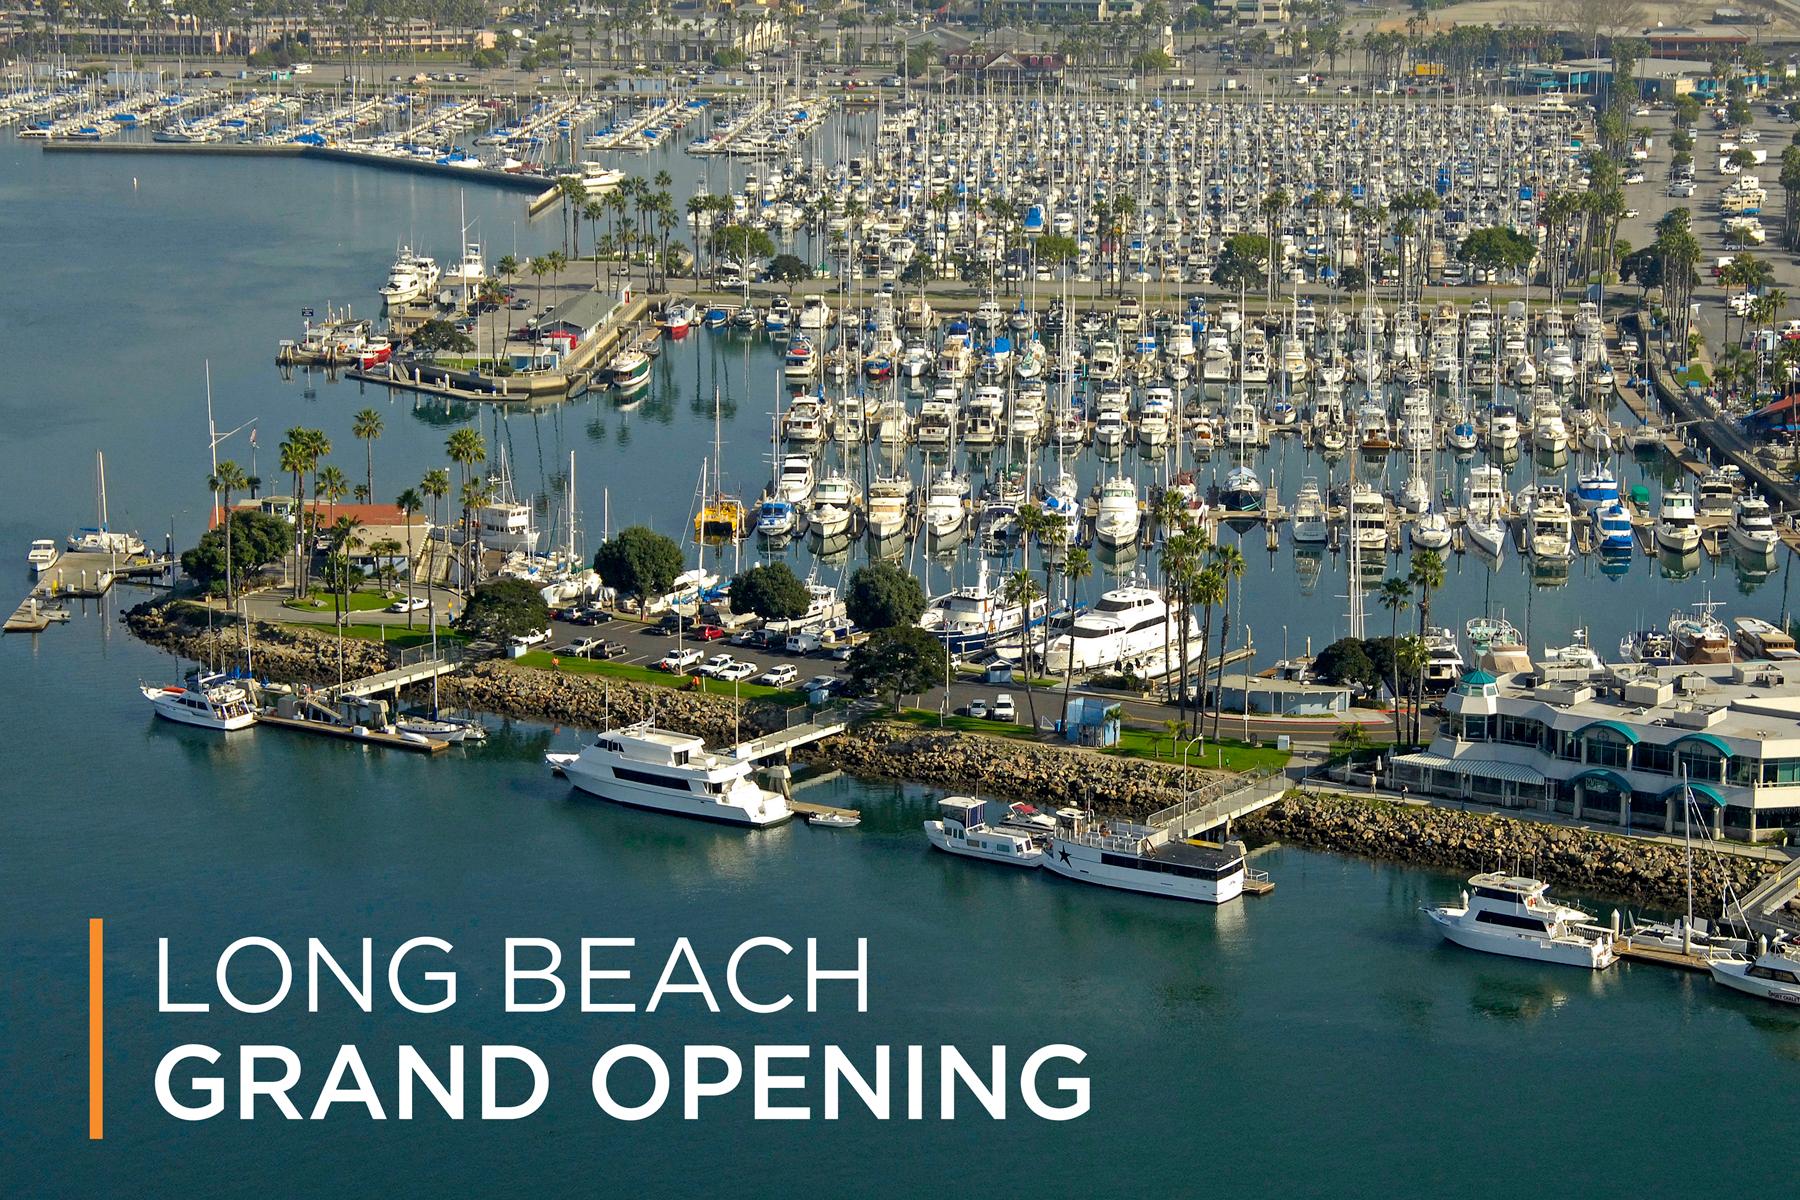 Celebrate Denison Long Beach Grand Opening